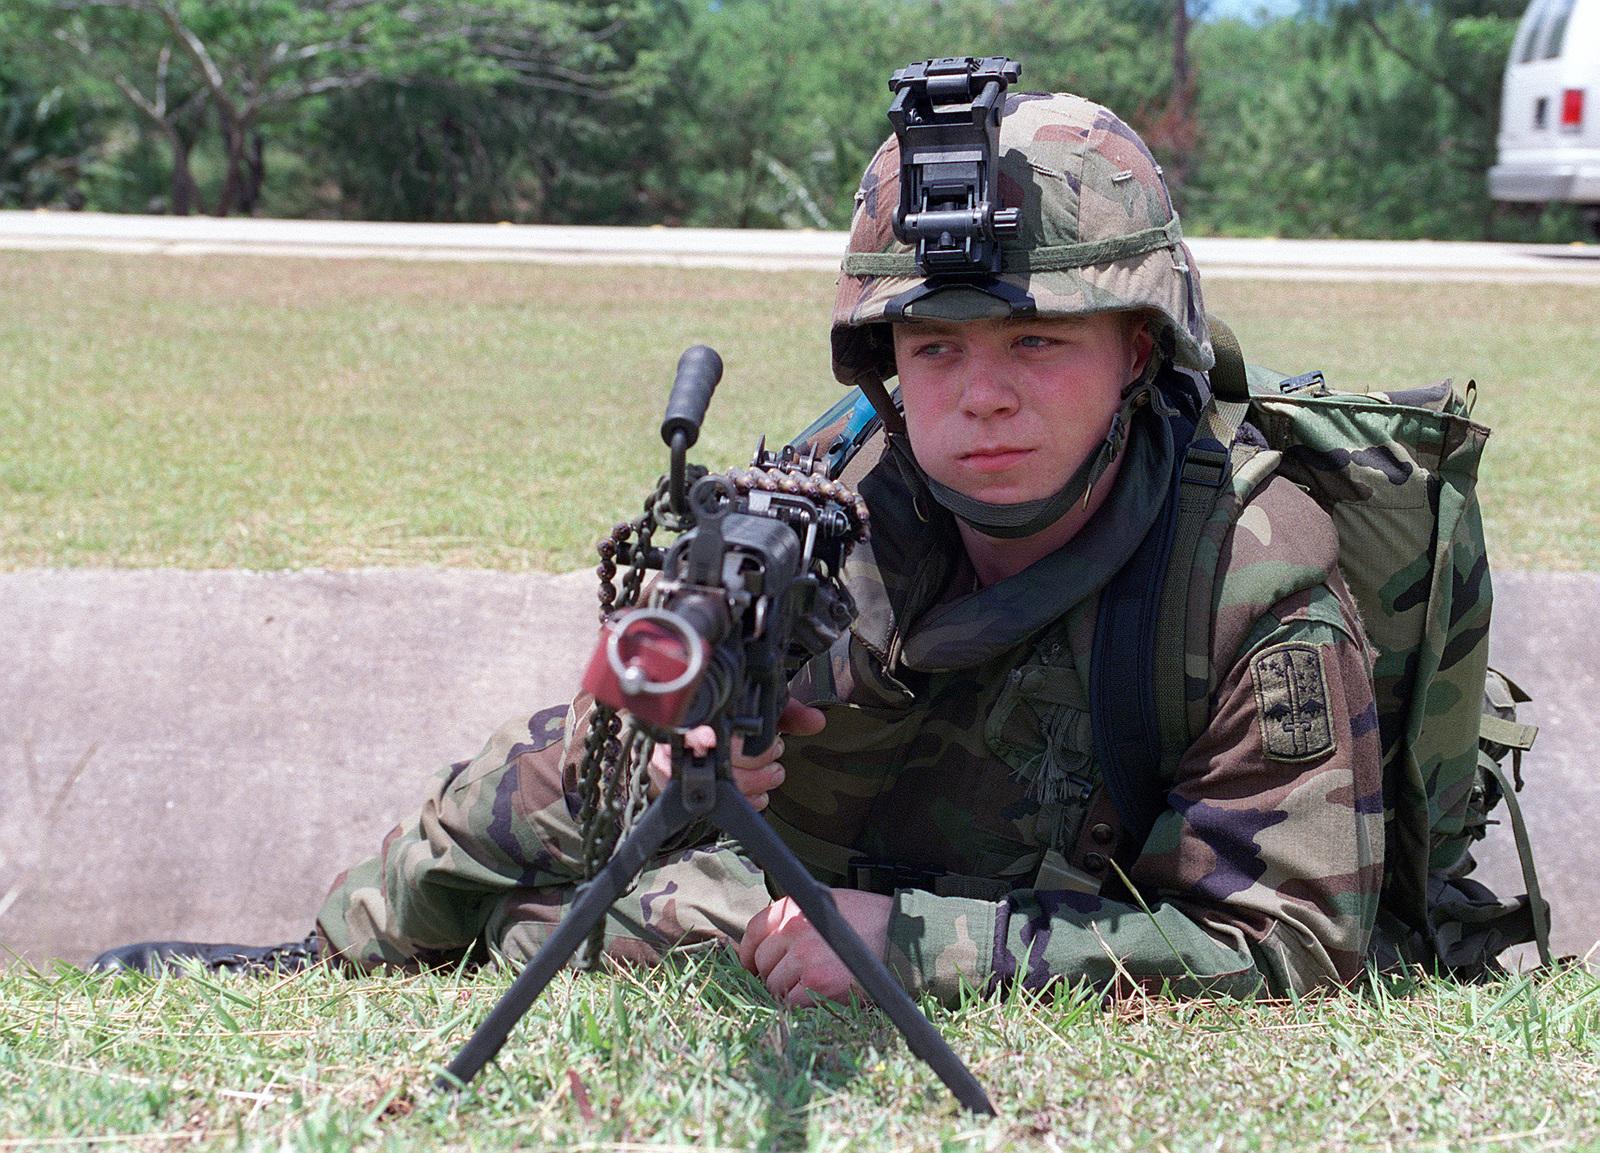 Corporal Daniel Krug US Army USA 1ST Battalion 17th Infantry Division Mans His 556mm M249